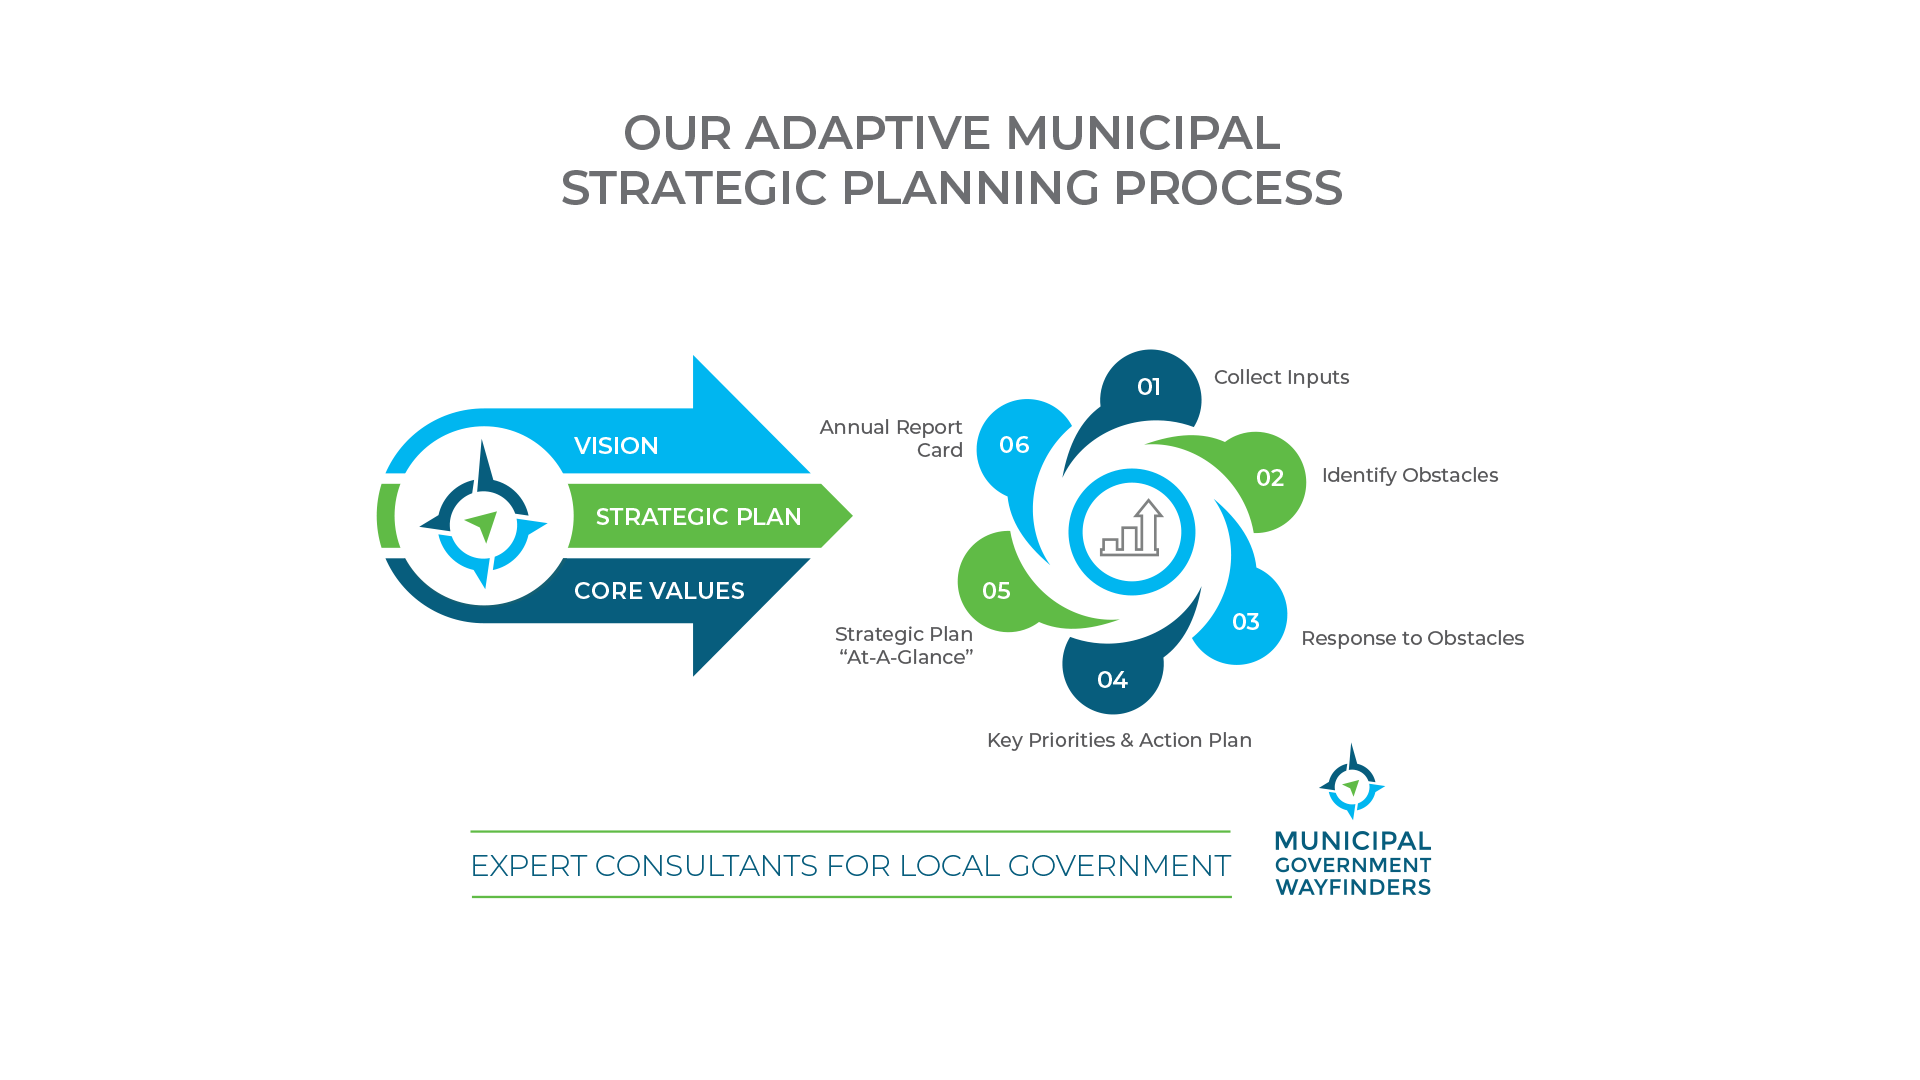 Municipal Government Wayfinders